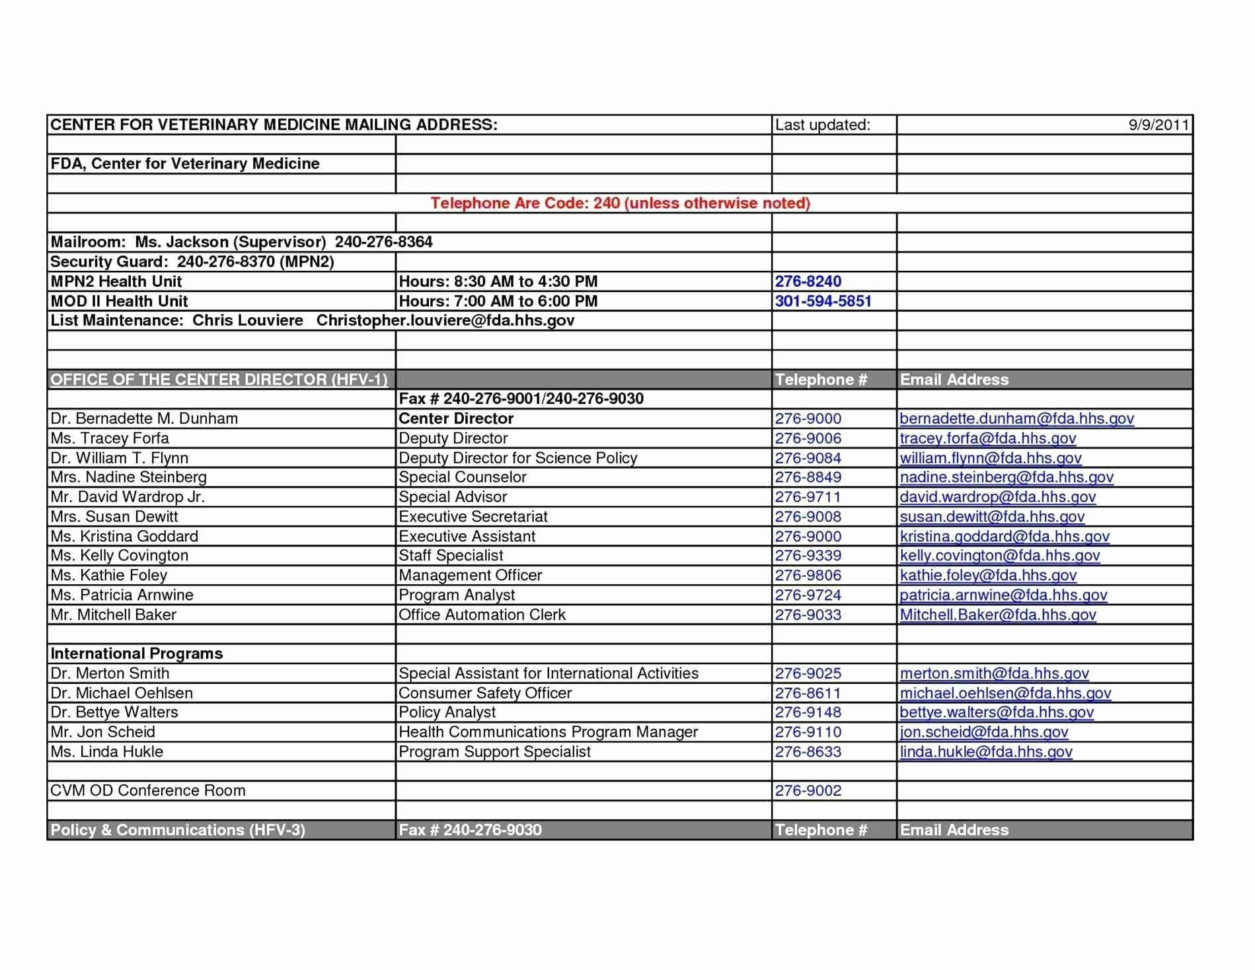 P90X Spreadsheet Google Docs Throughout P90X Workout Sheets Elegant P90X Printable Calendar Unique Free